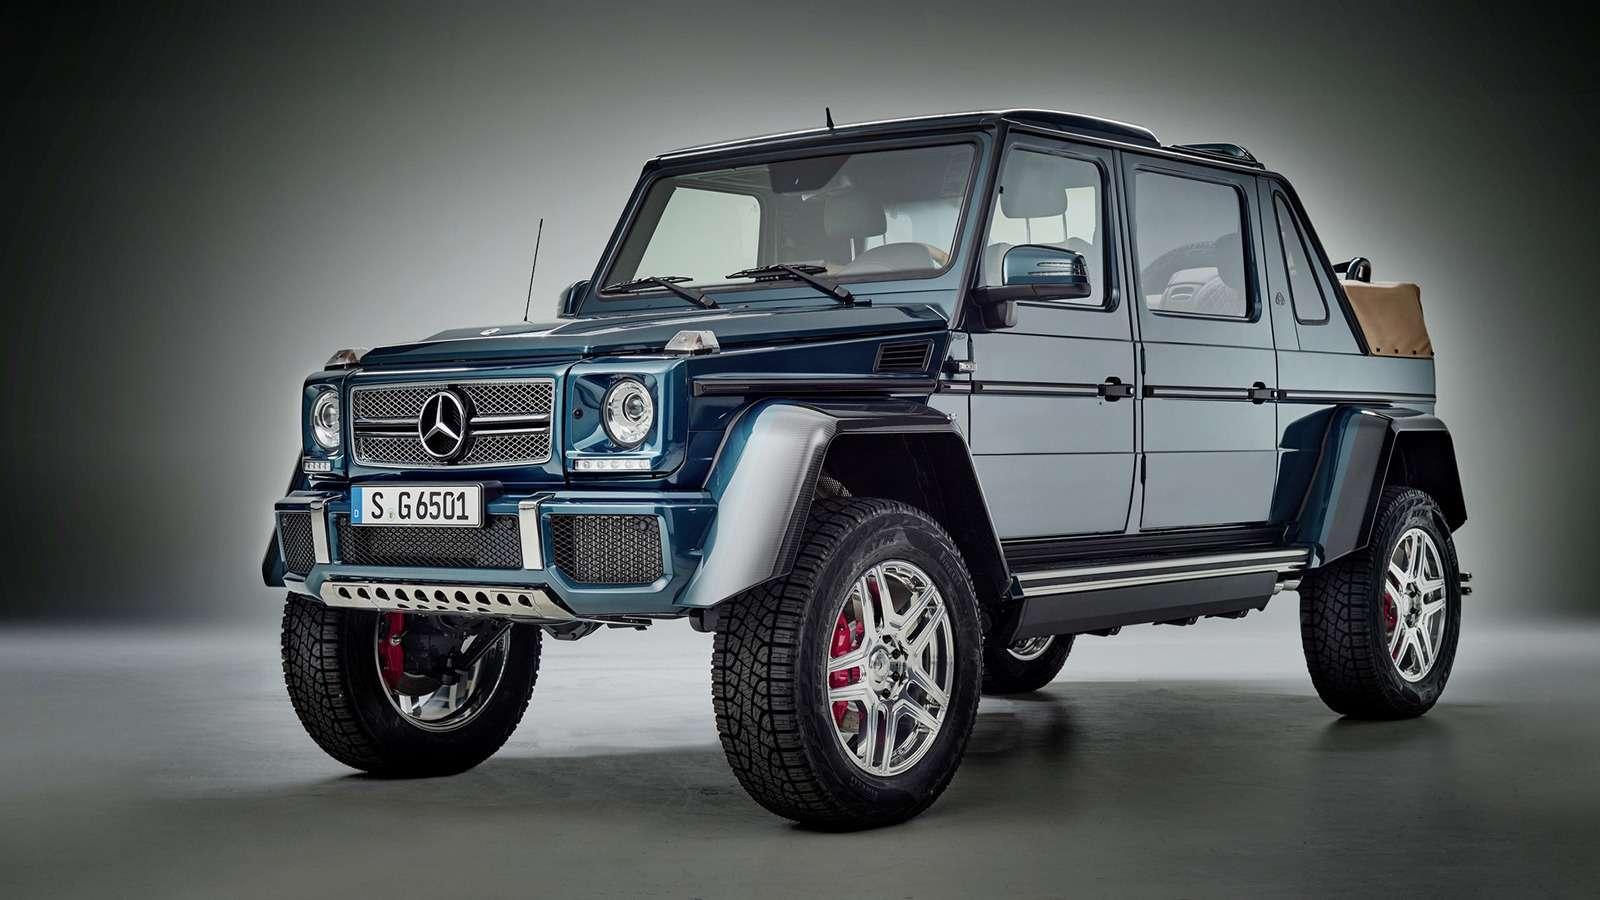 Внедорожник Maybach продали за1,2 миллиона евро. Икупил его не шейх!— фото 803347